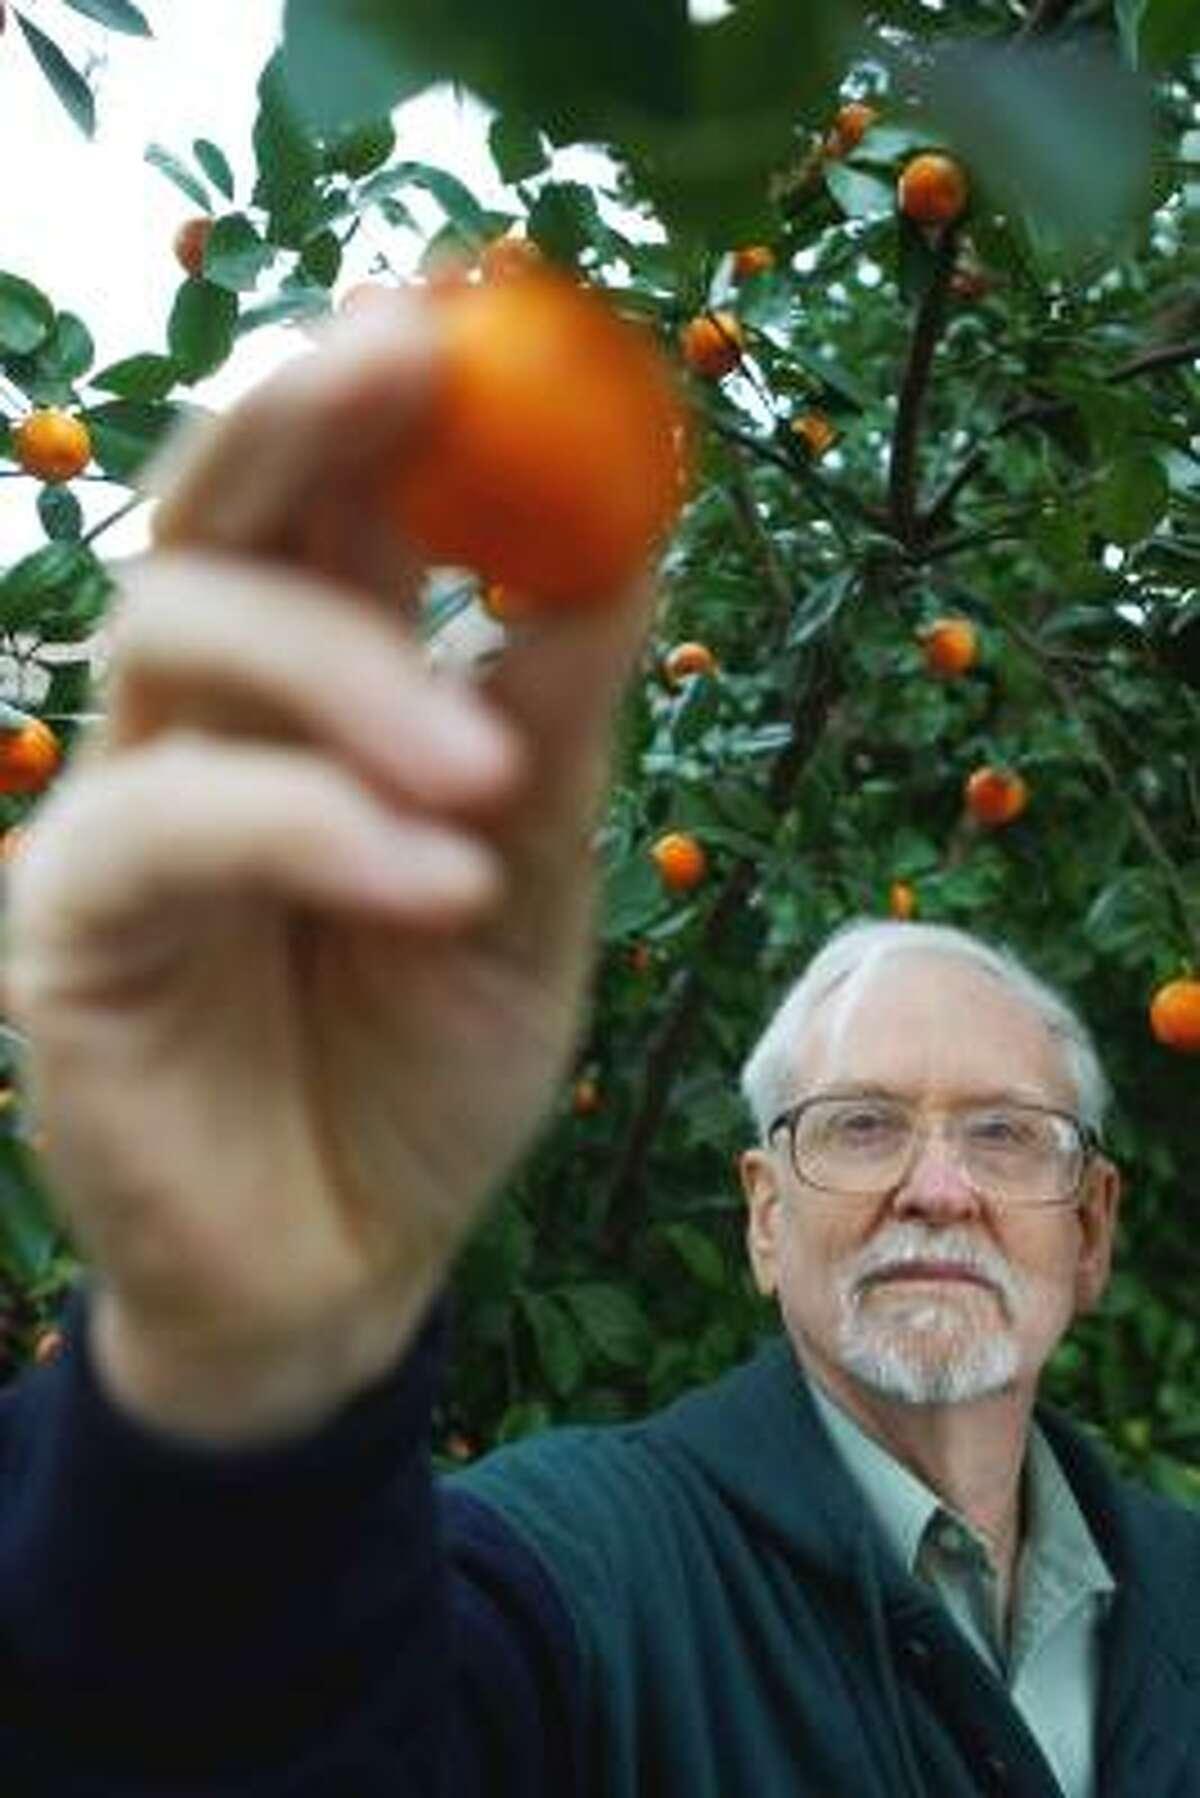 Bob Randall shows the fruit from his calamondin tree.